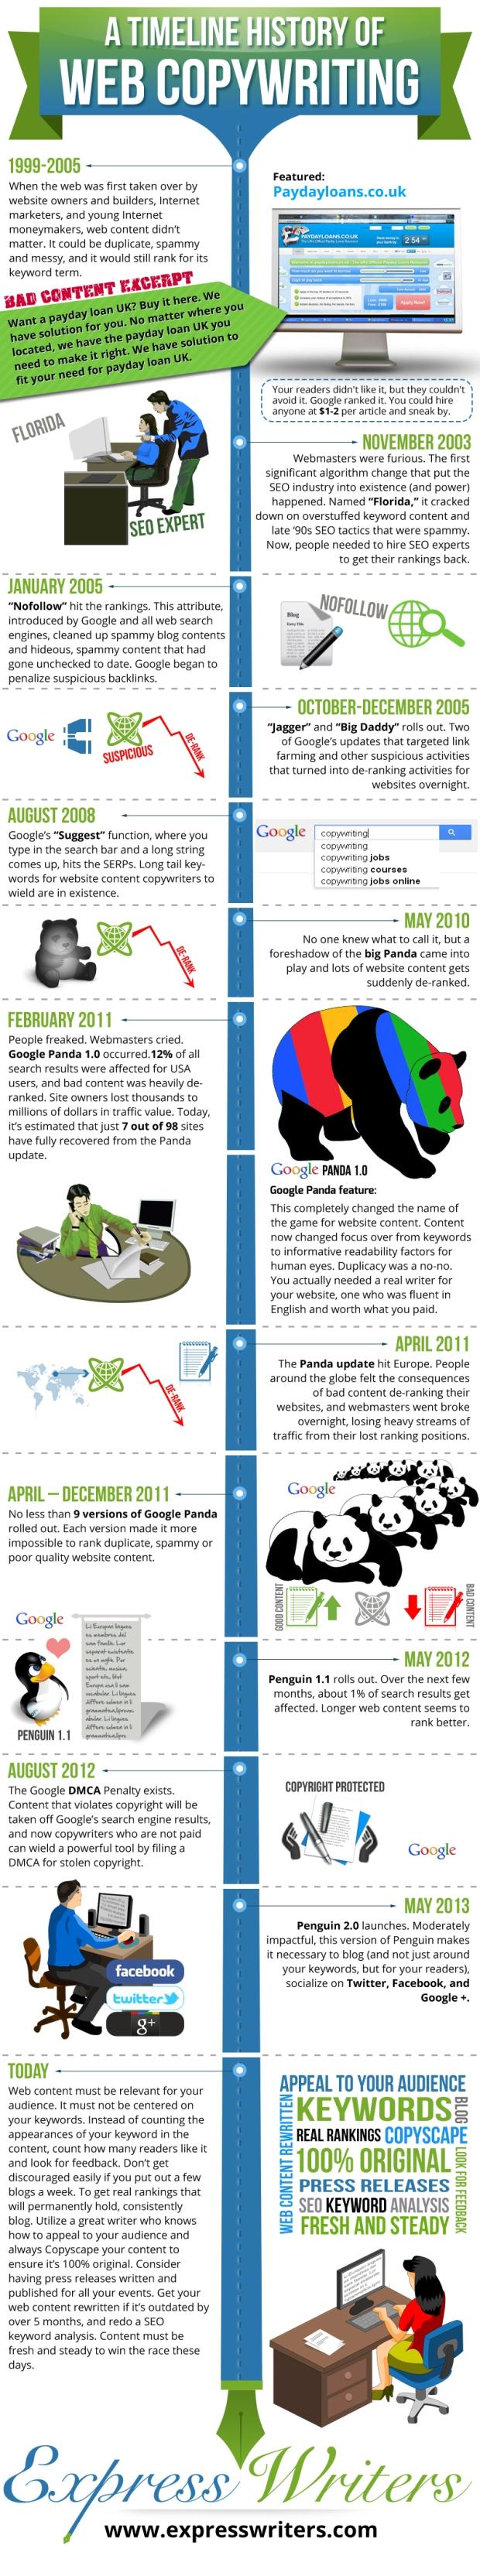 a-timeline-history-of-seo-and-web-copywriting_525e391f5492d